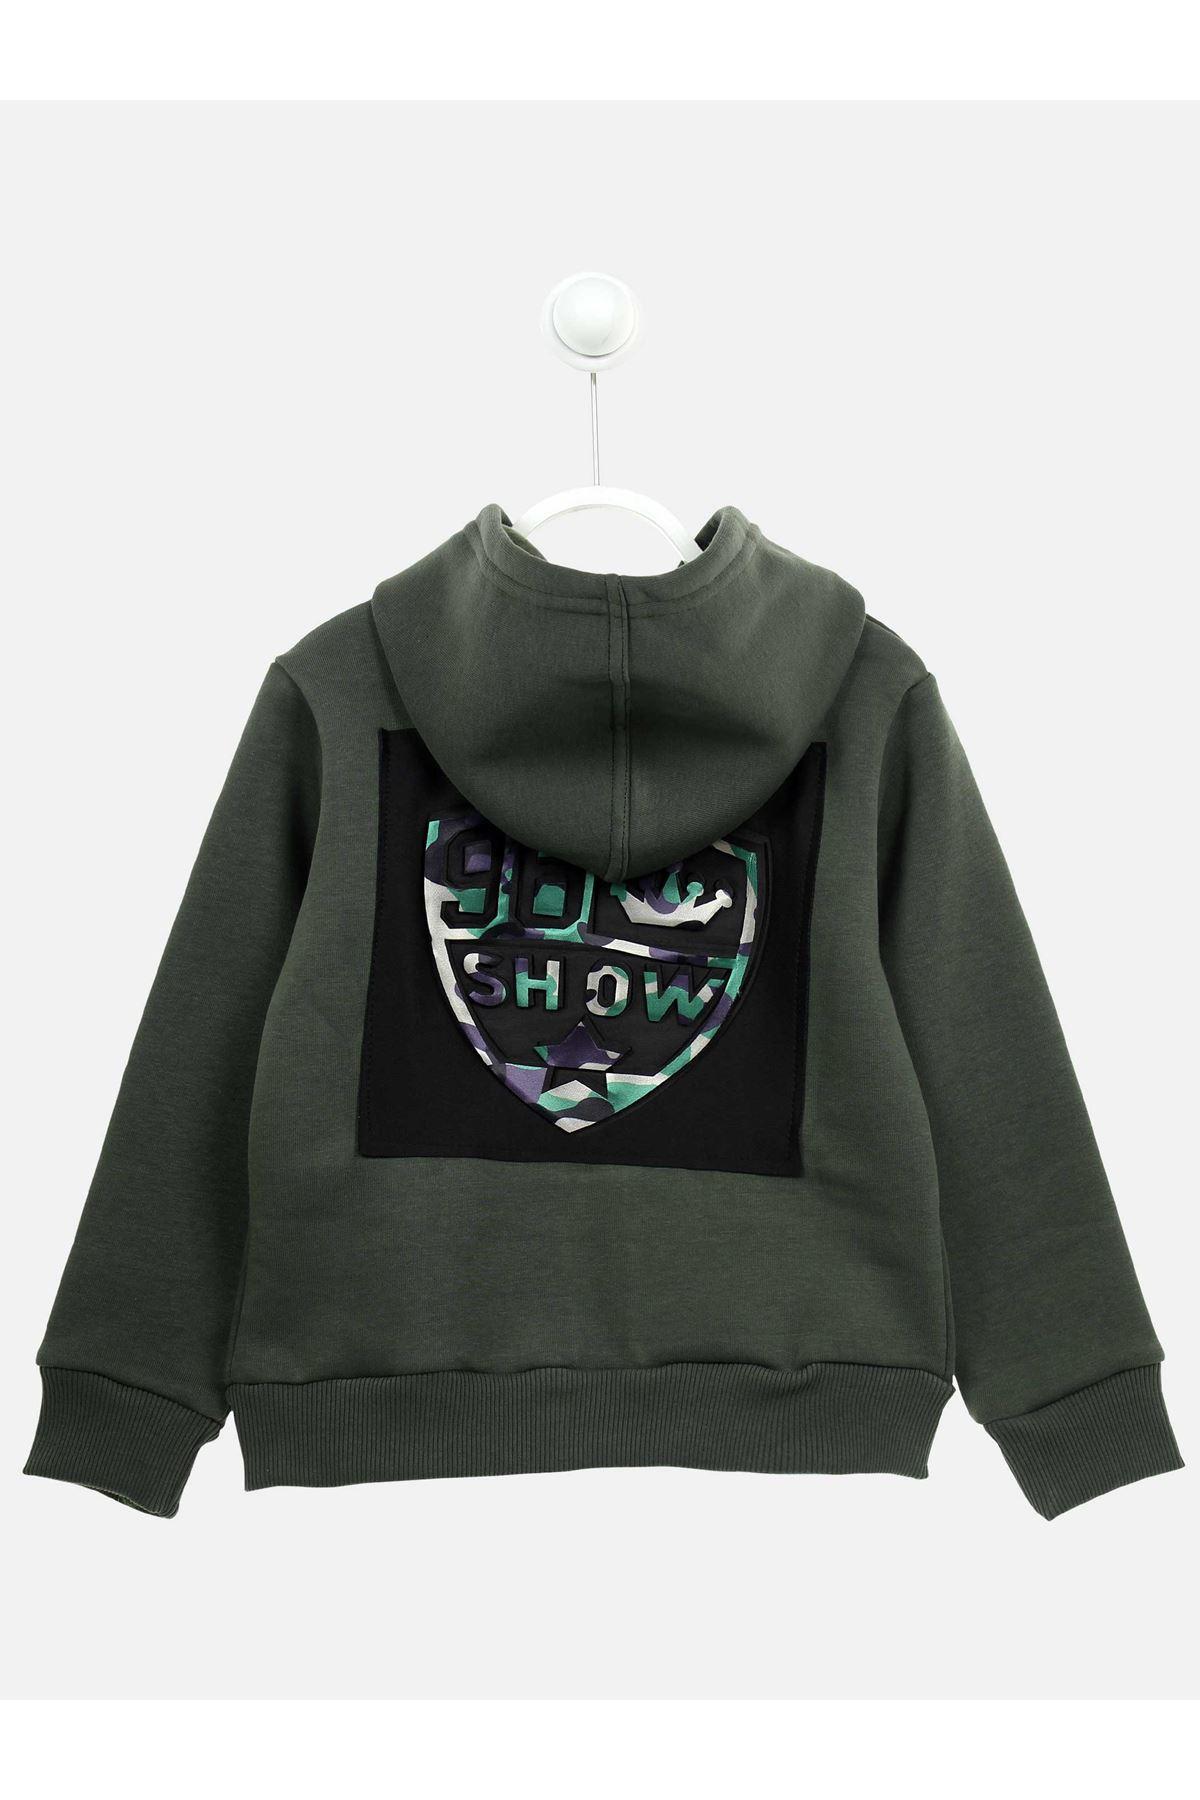 Khaki Winterisation Male Child Jacket